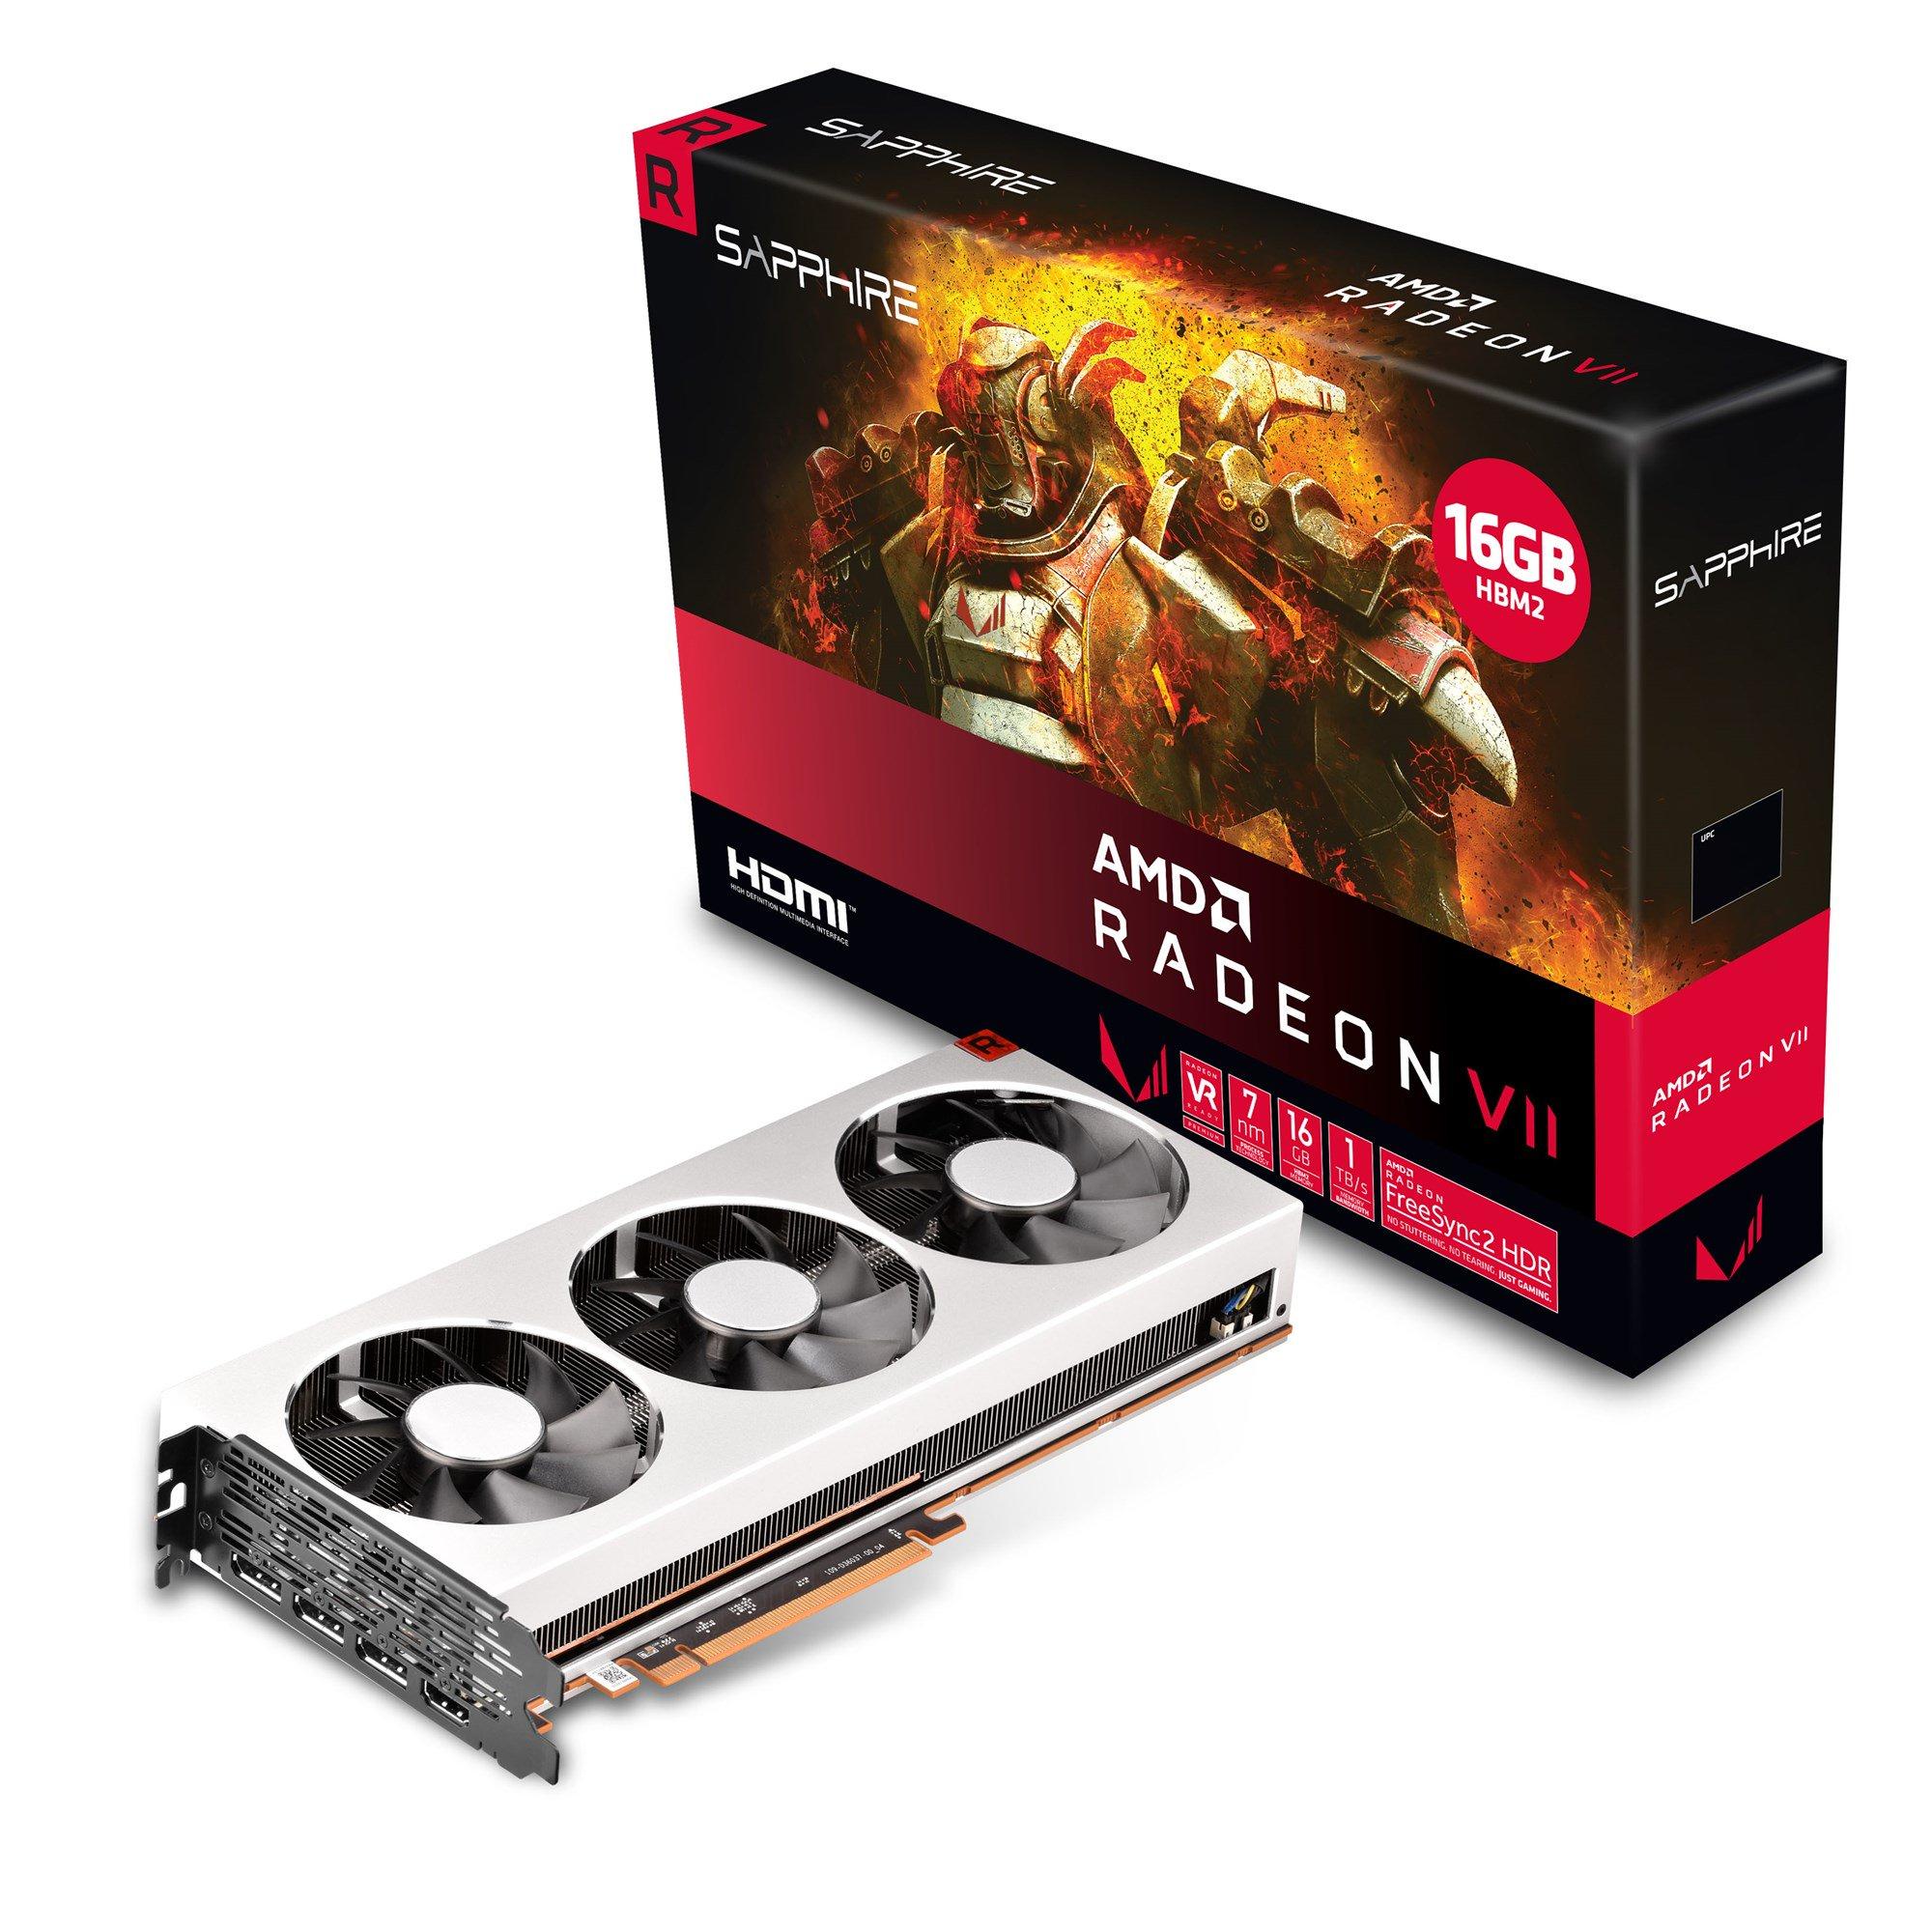 Sapphire Radeon VII 16GB Graphics Card £619.99 at CCL